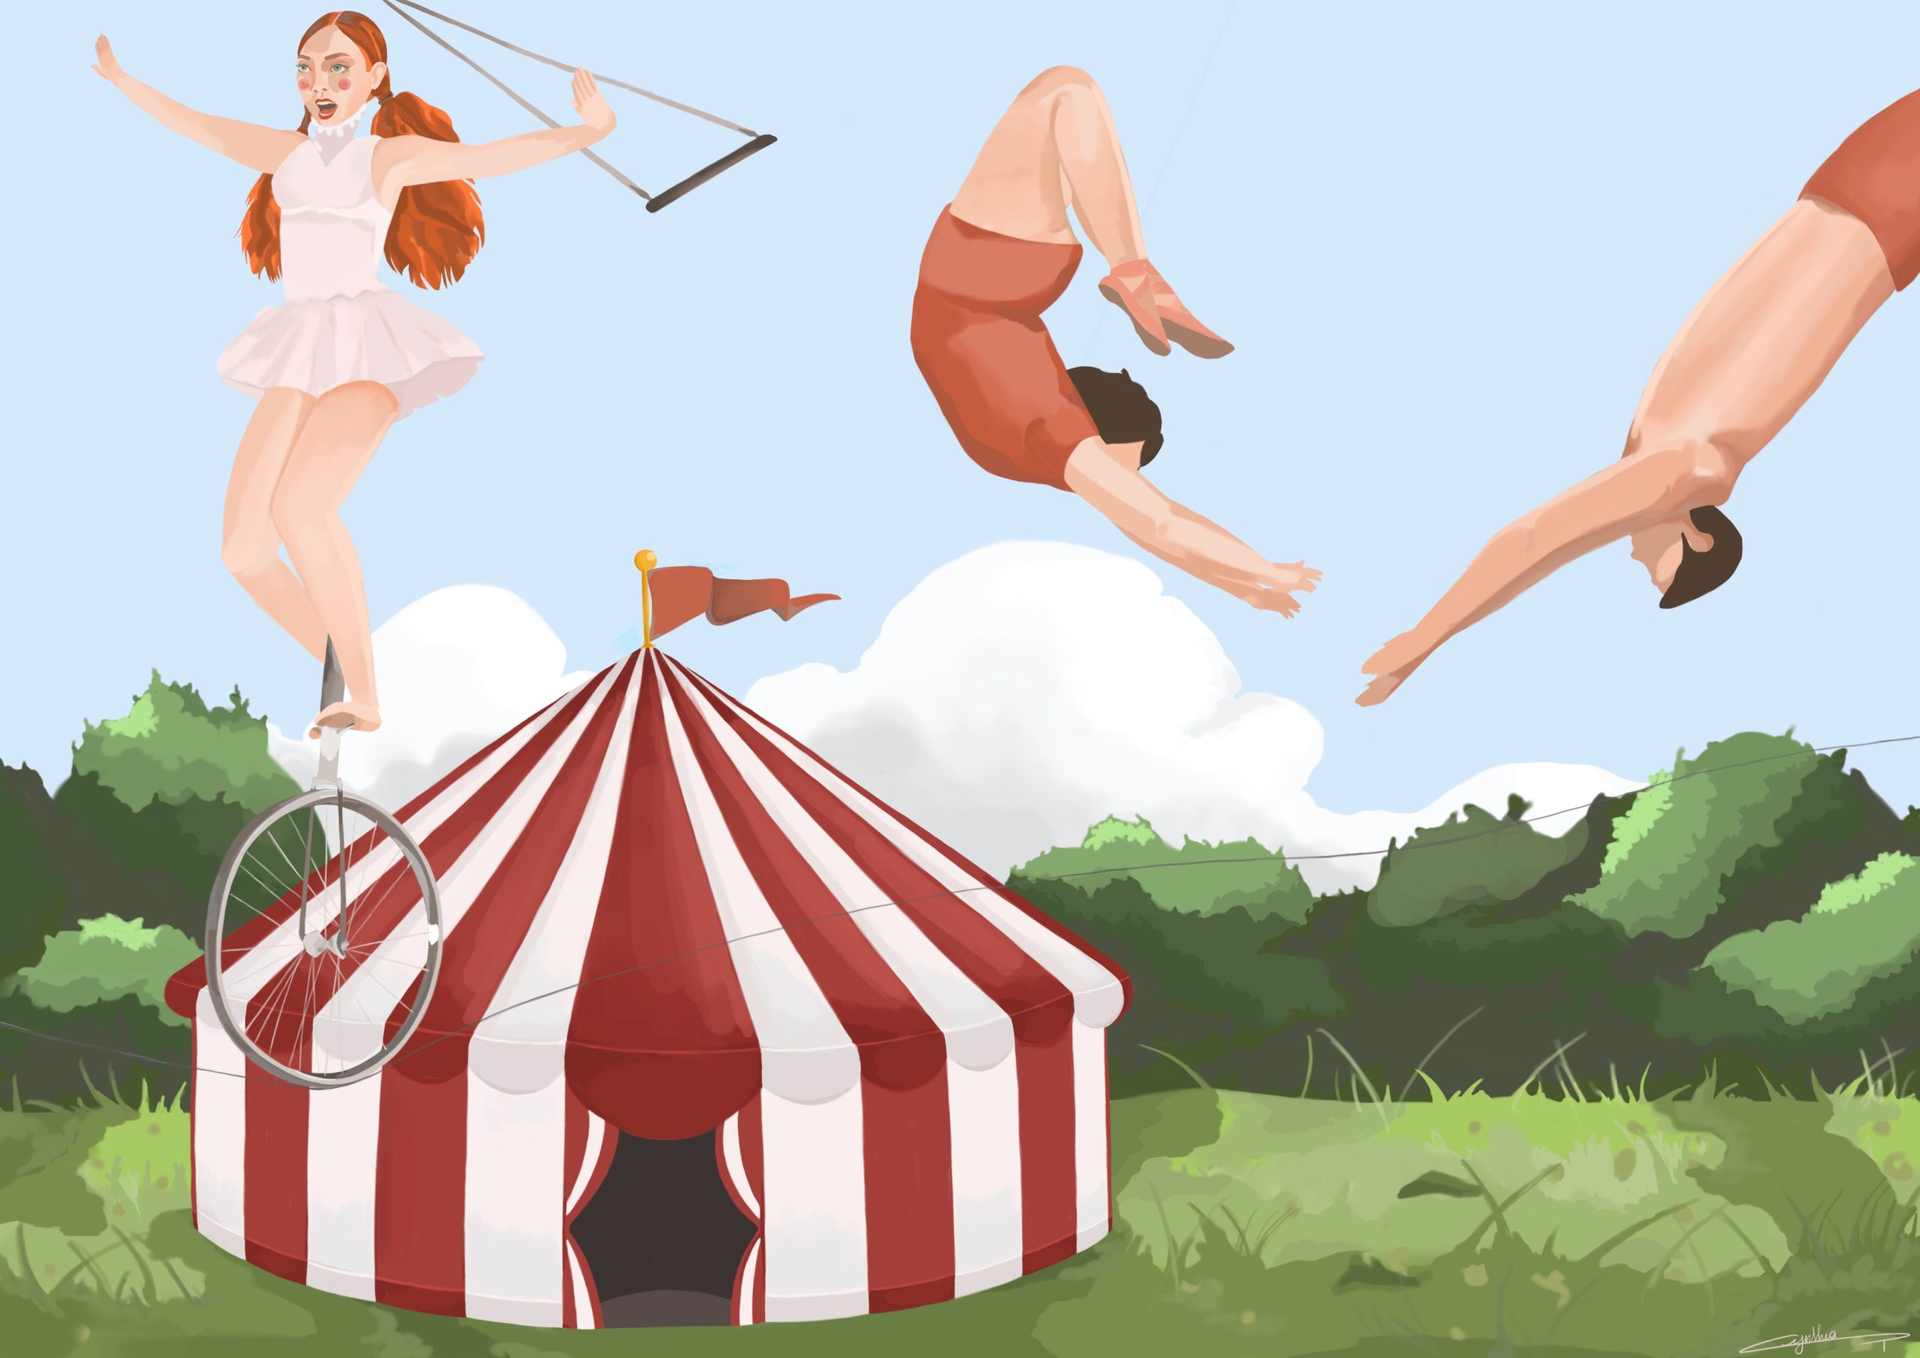 Au cirque illustration de Cynthia Artstudio